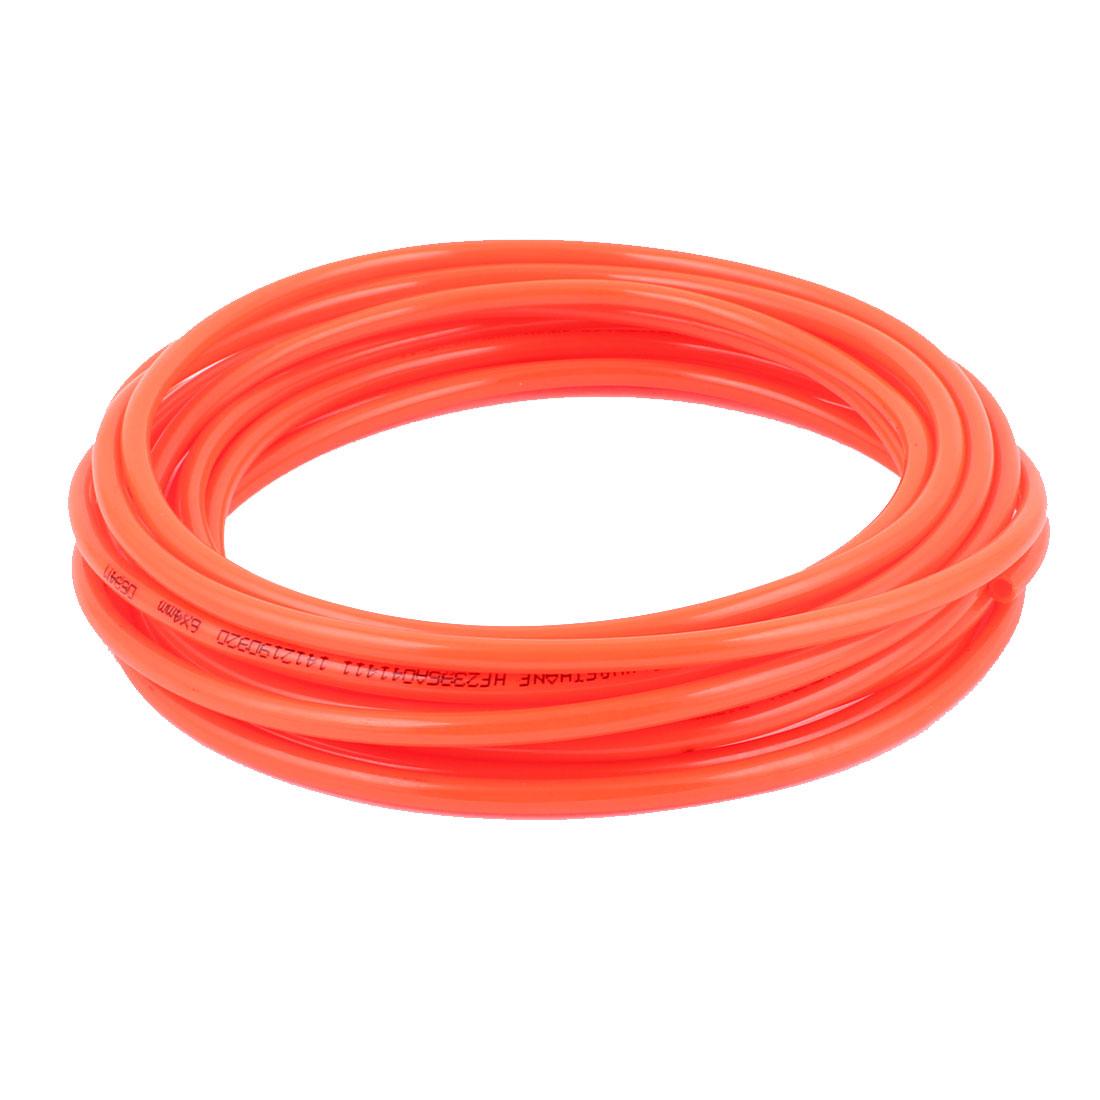 6mm x 4mm Fleaxible PU Tube Pneumatic Polyurethane Hose 6.7M Long Orange